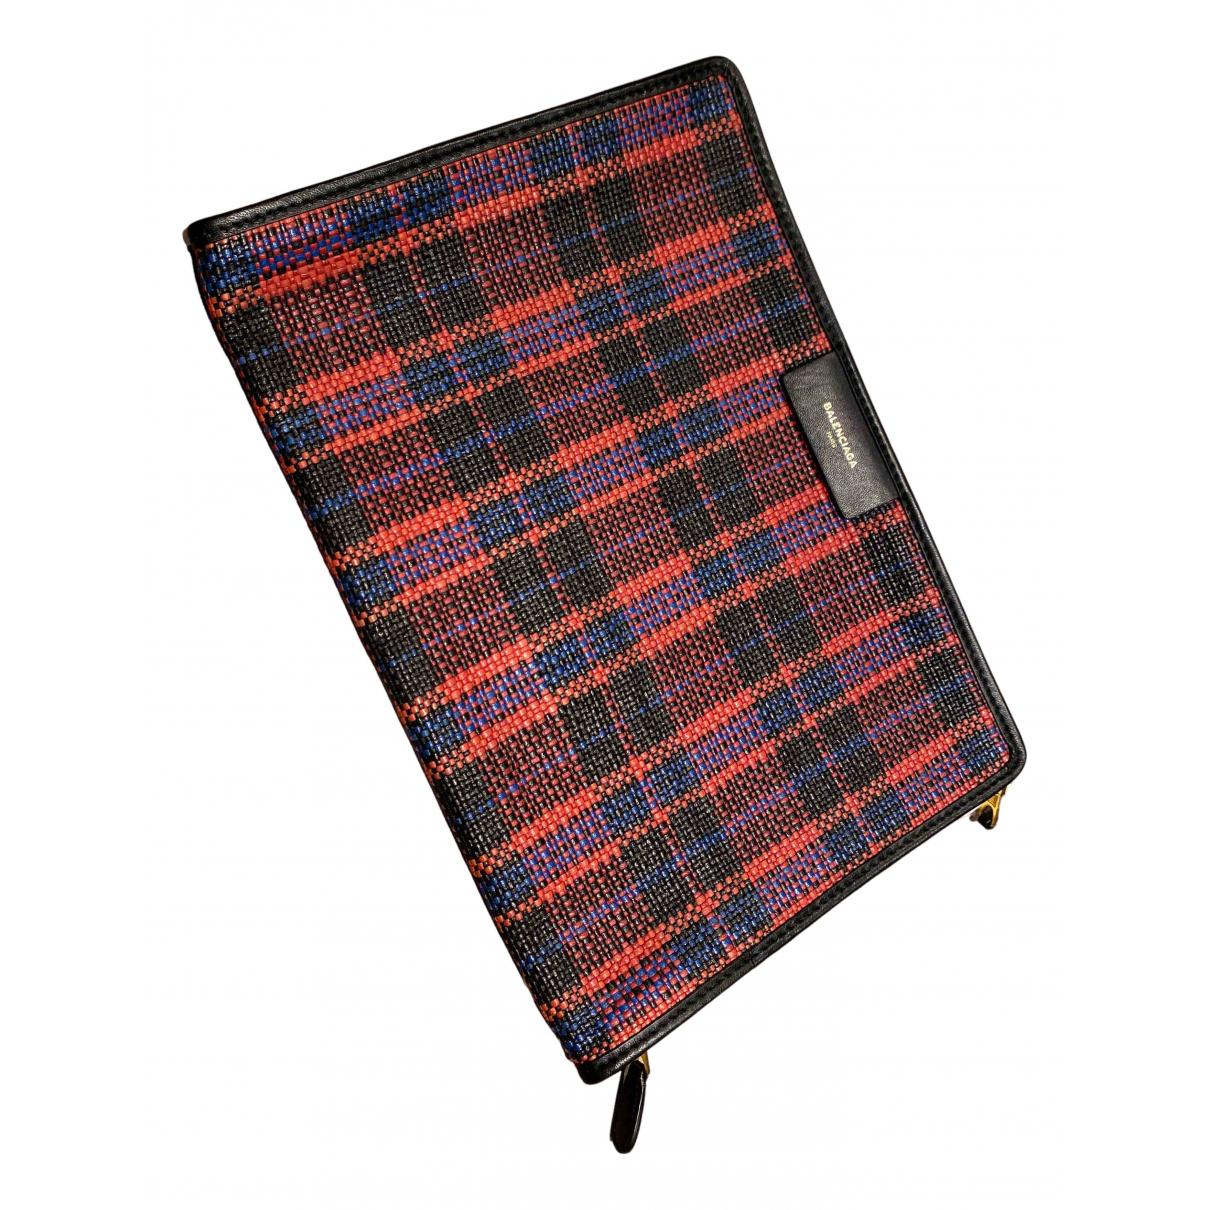 Balenciaga N Multicolour Leather Small bag, wallet & cases for Men N